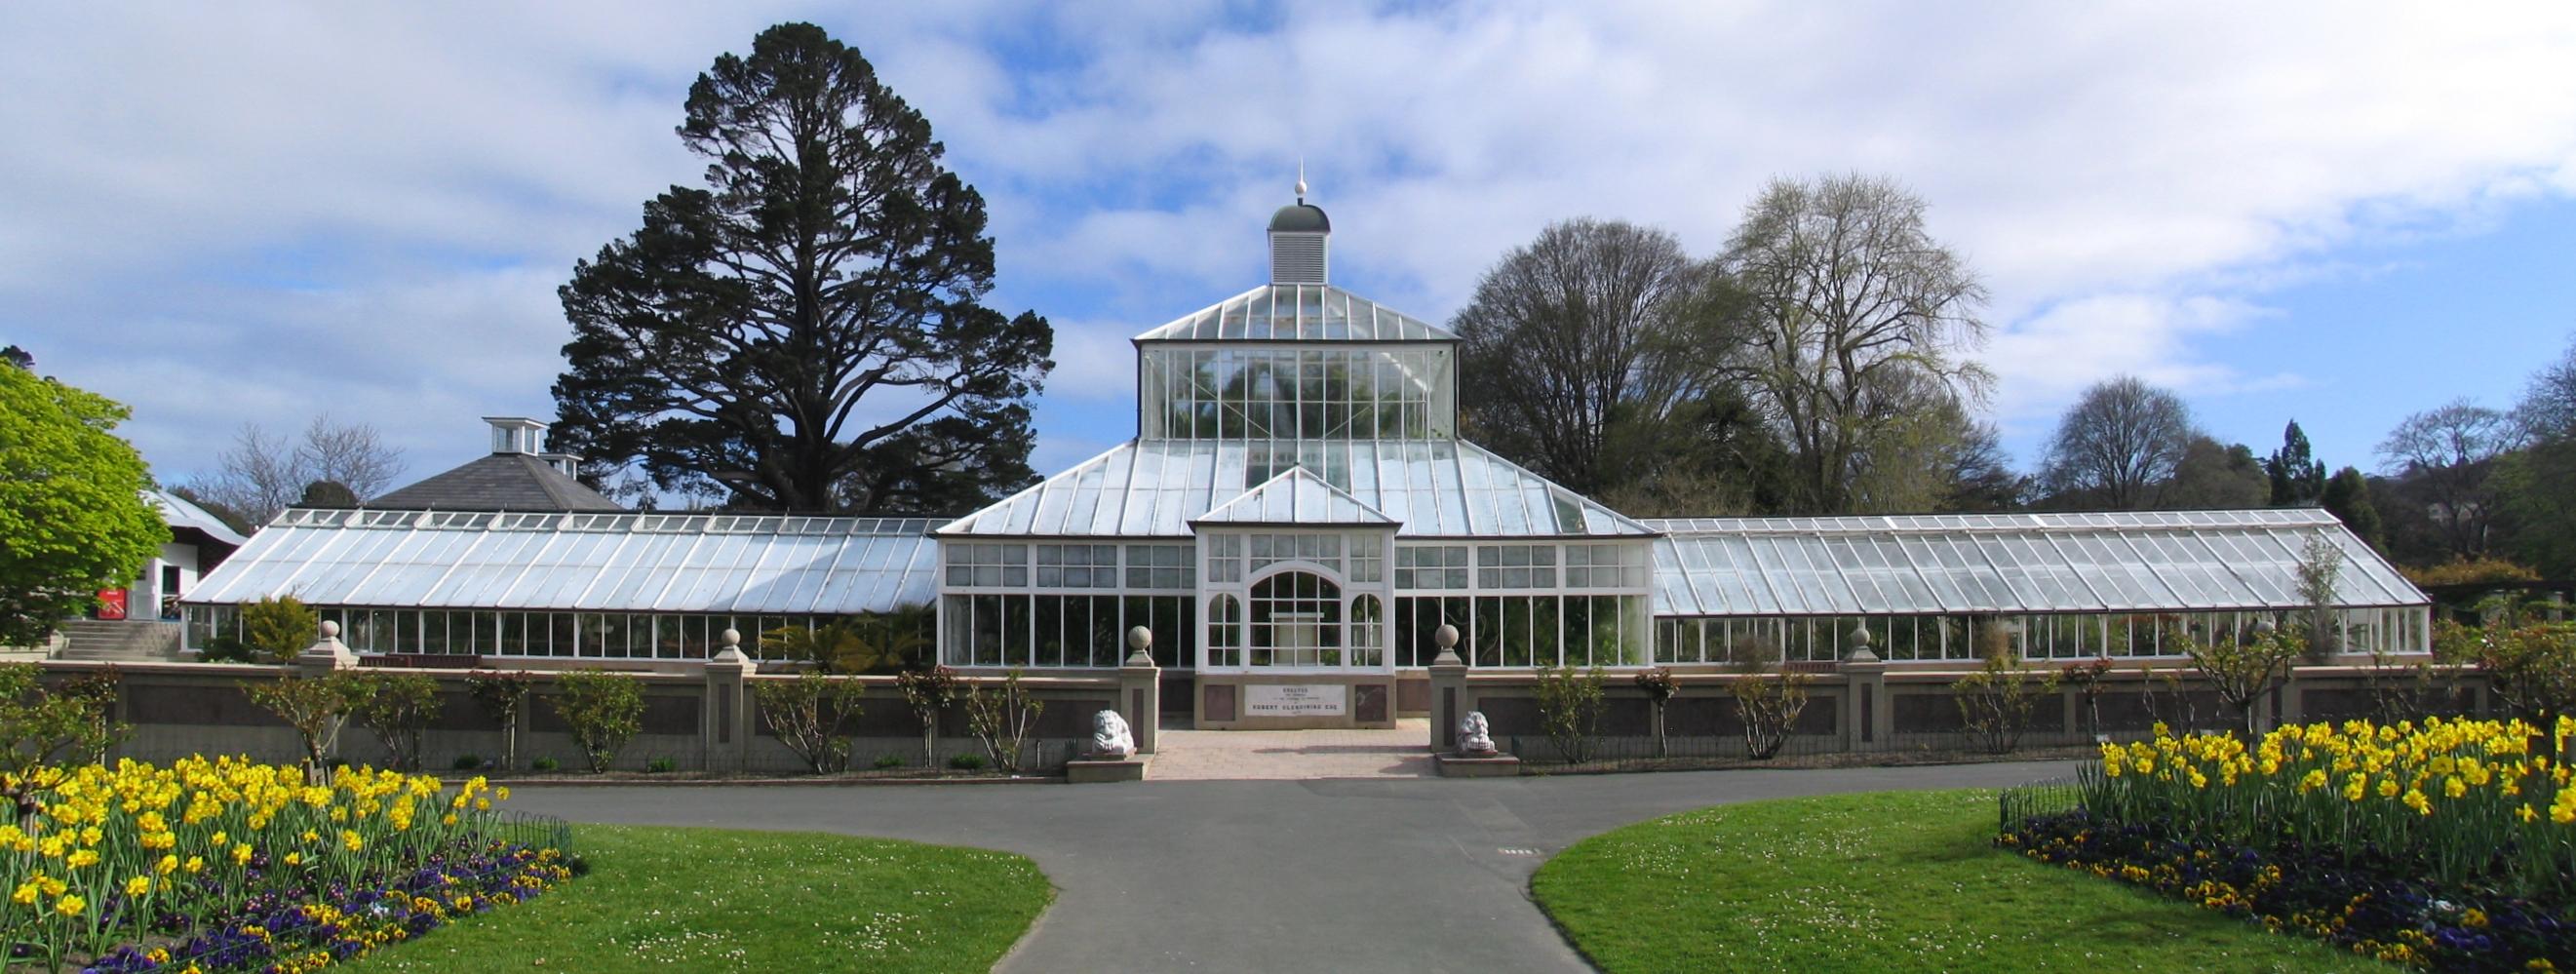 Dunedin Botanic Gardens Cafe